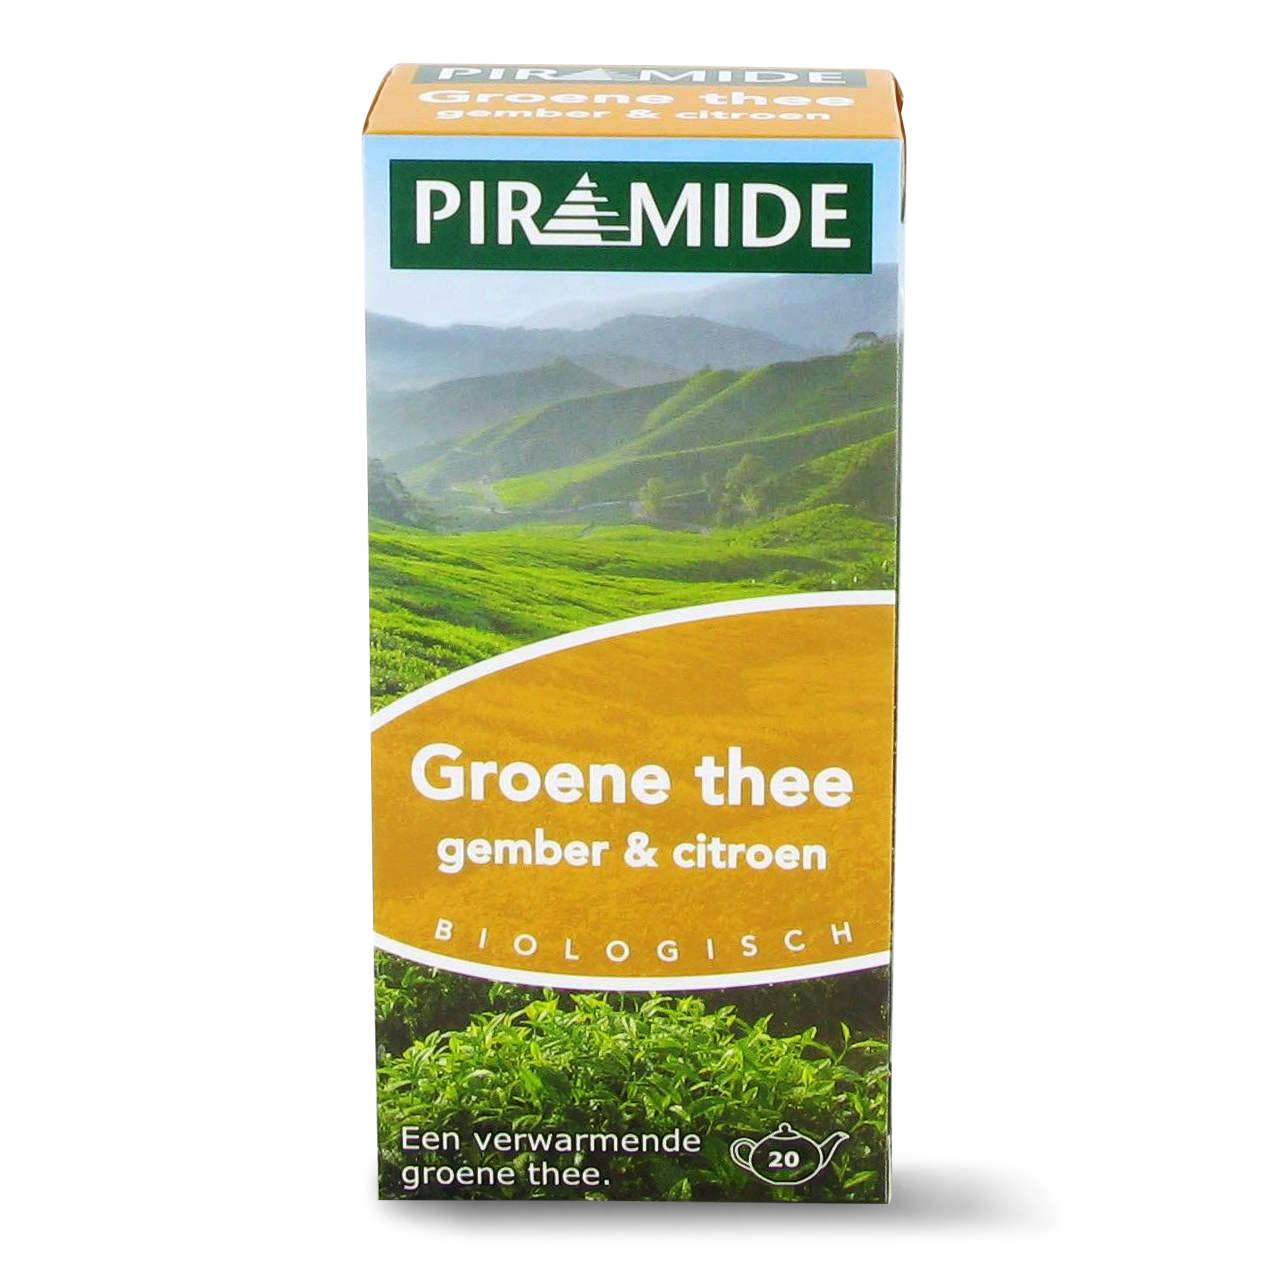 groene thee en hoge bloeddruk